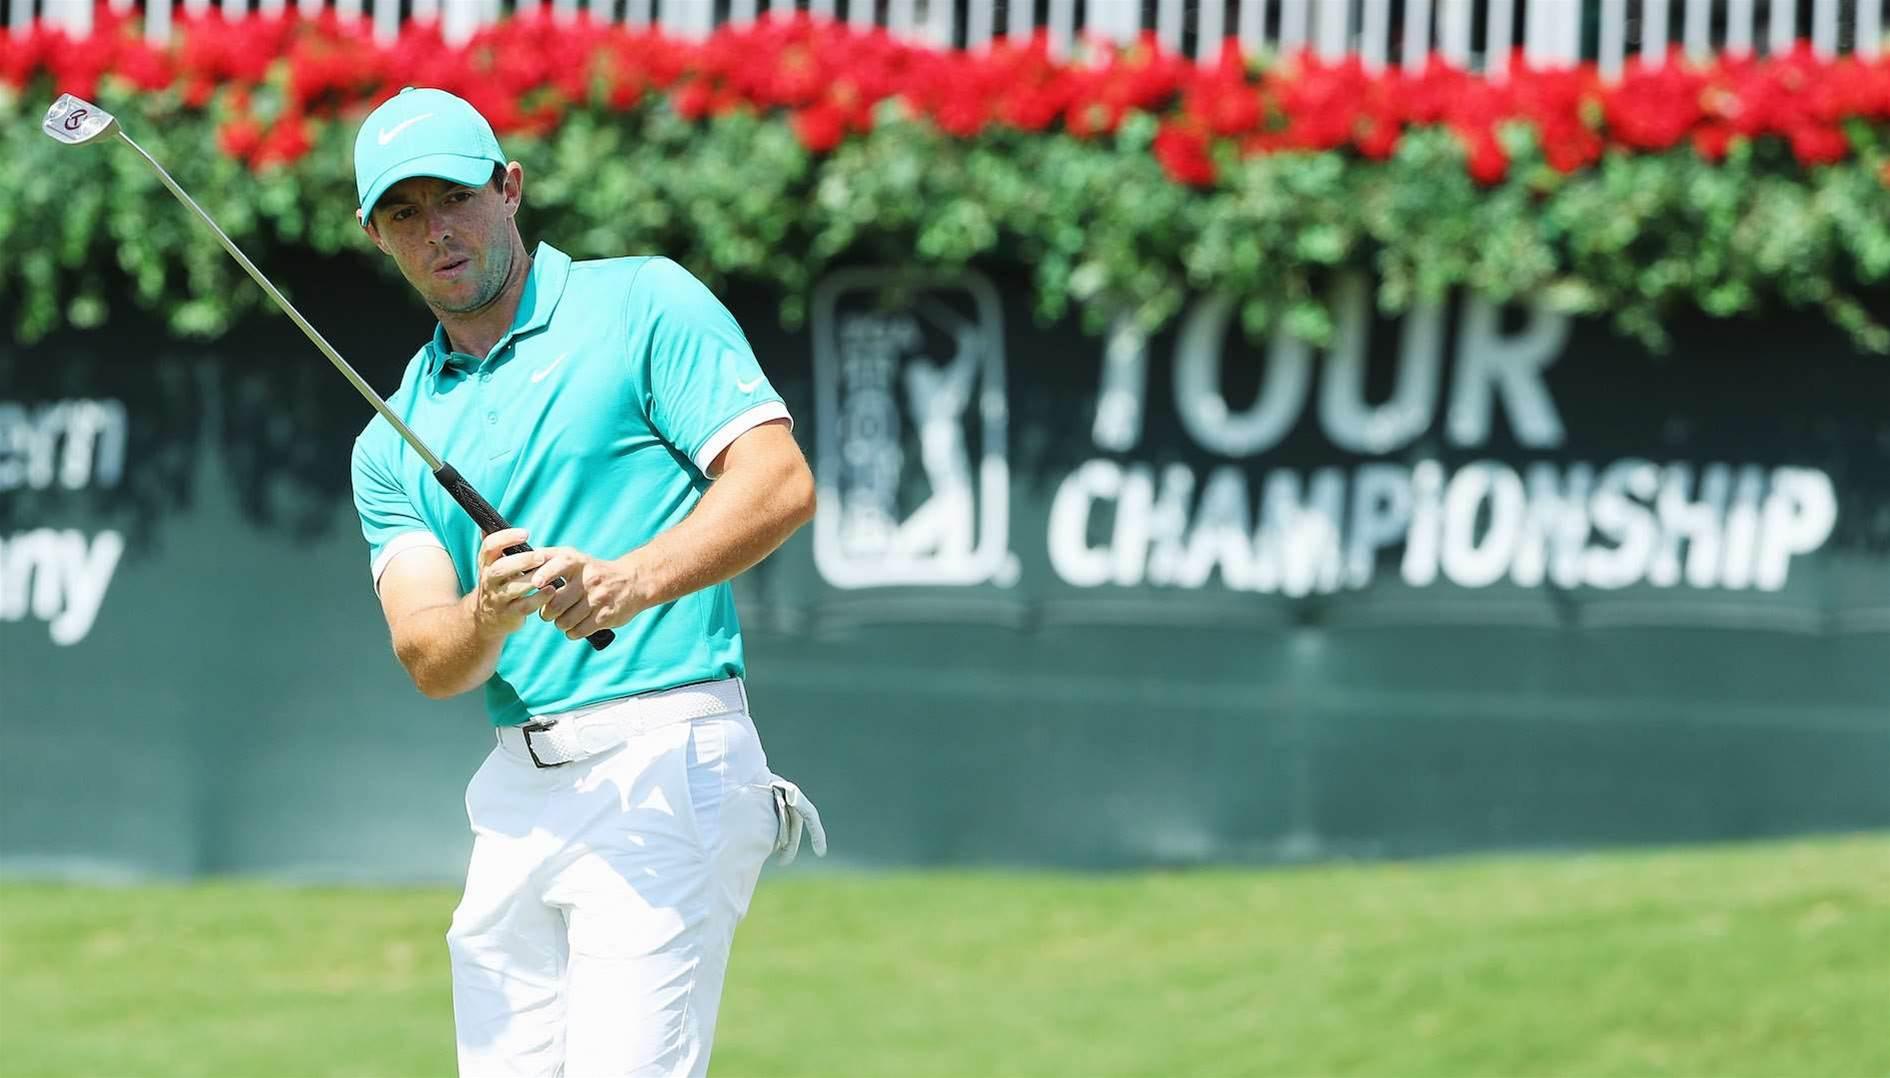 PGA TOUR: McIlroy eyes final round duel with Dustin